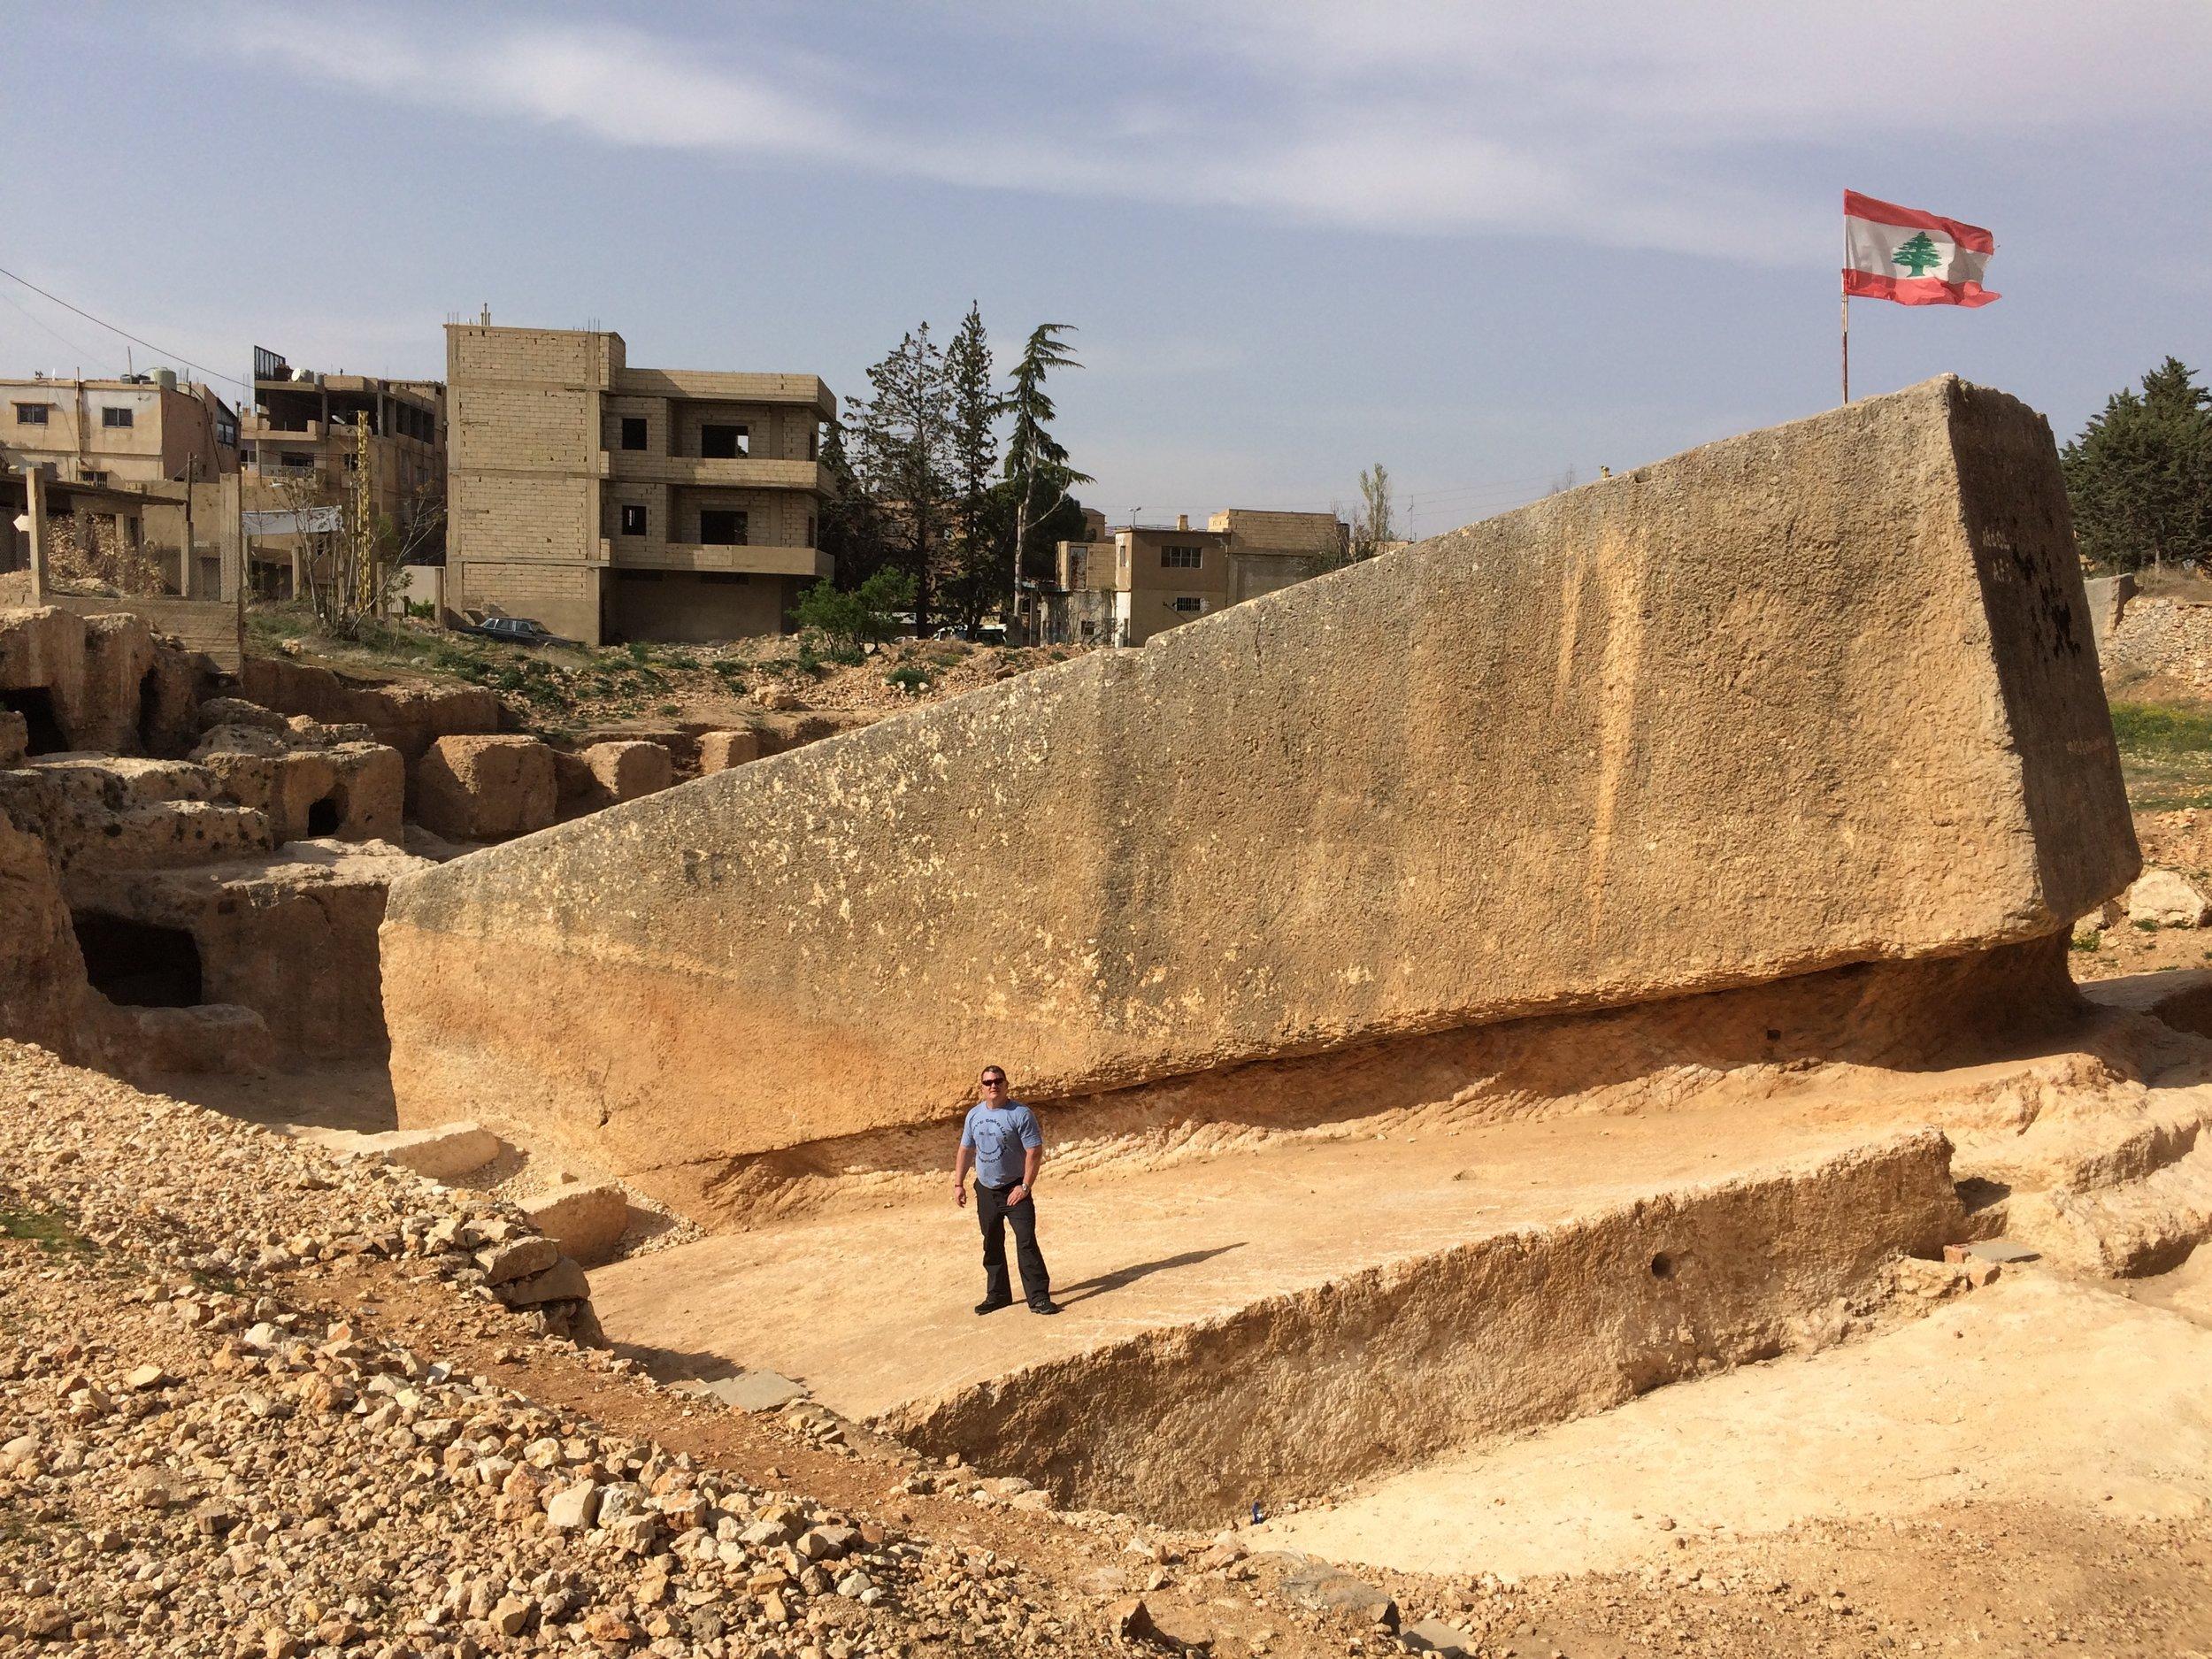 Hajjar Al-Nibla or the 'Stone of the Pregnant Woman'